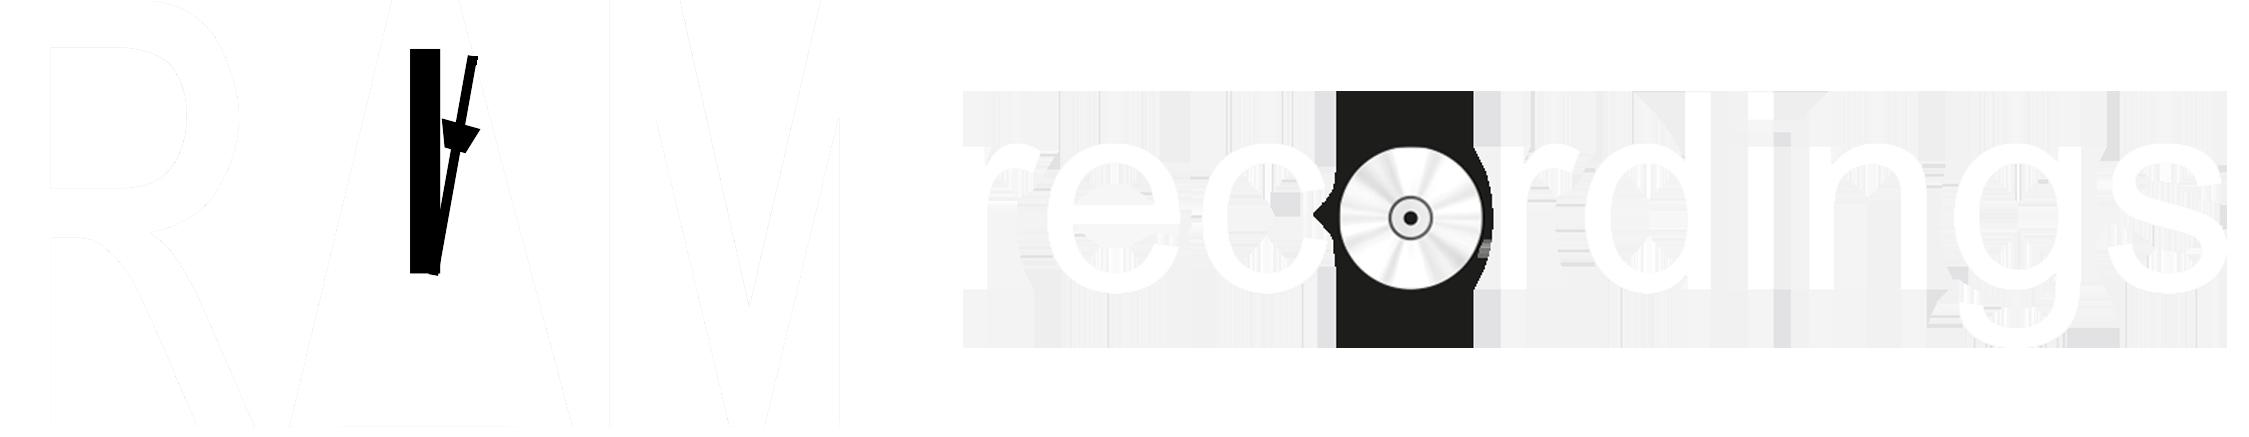 RAM recordings